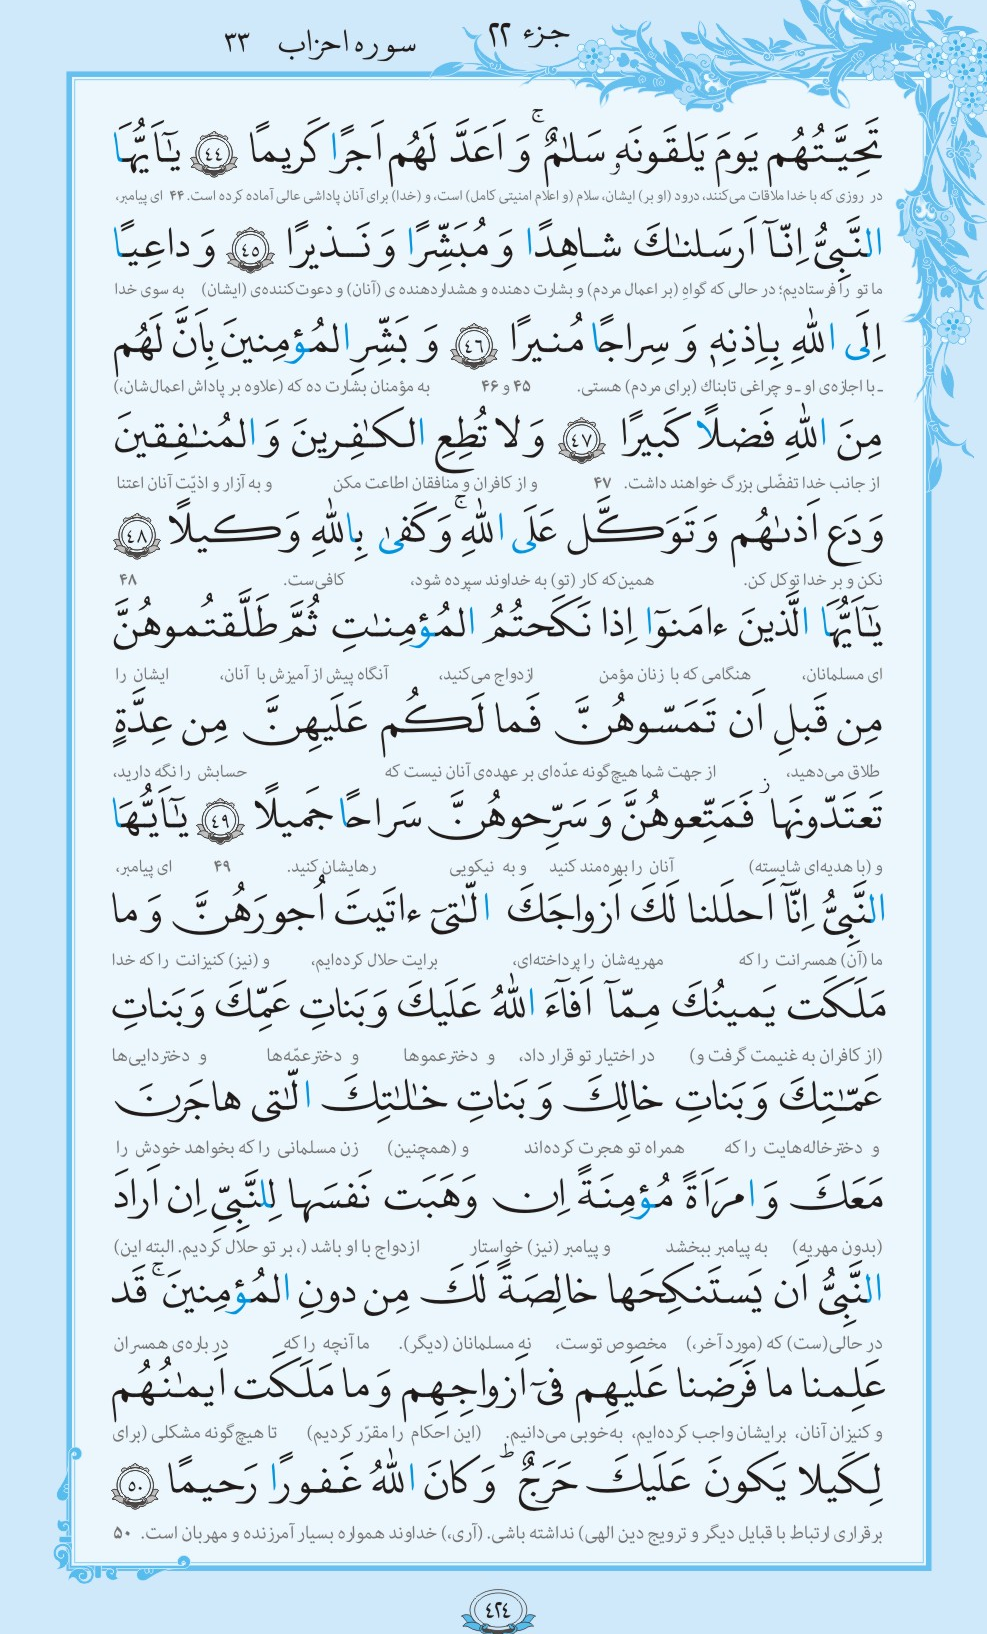 13990427000297 Test NewPhotoFree - ترتیل صفحه ۴۲۴  قرآن باصدای عبدالباسط+صوت و متن